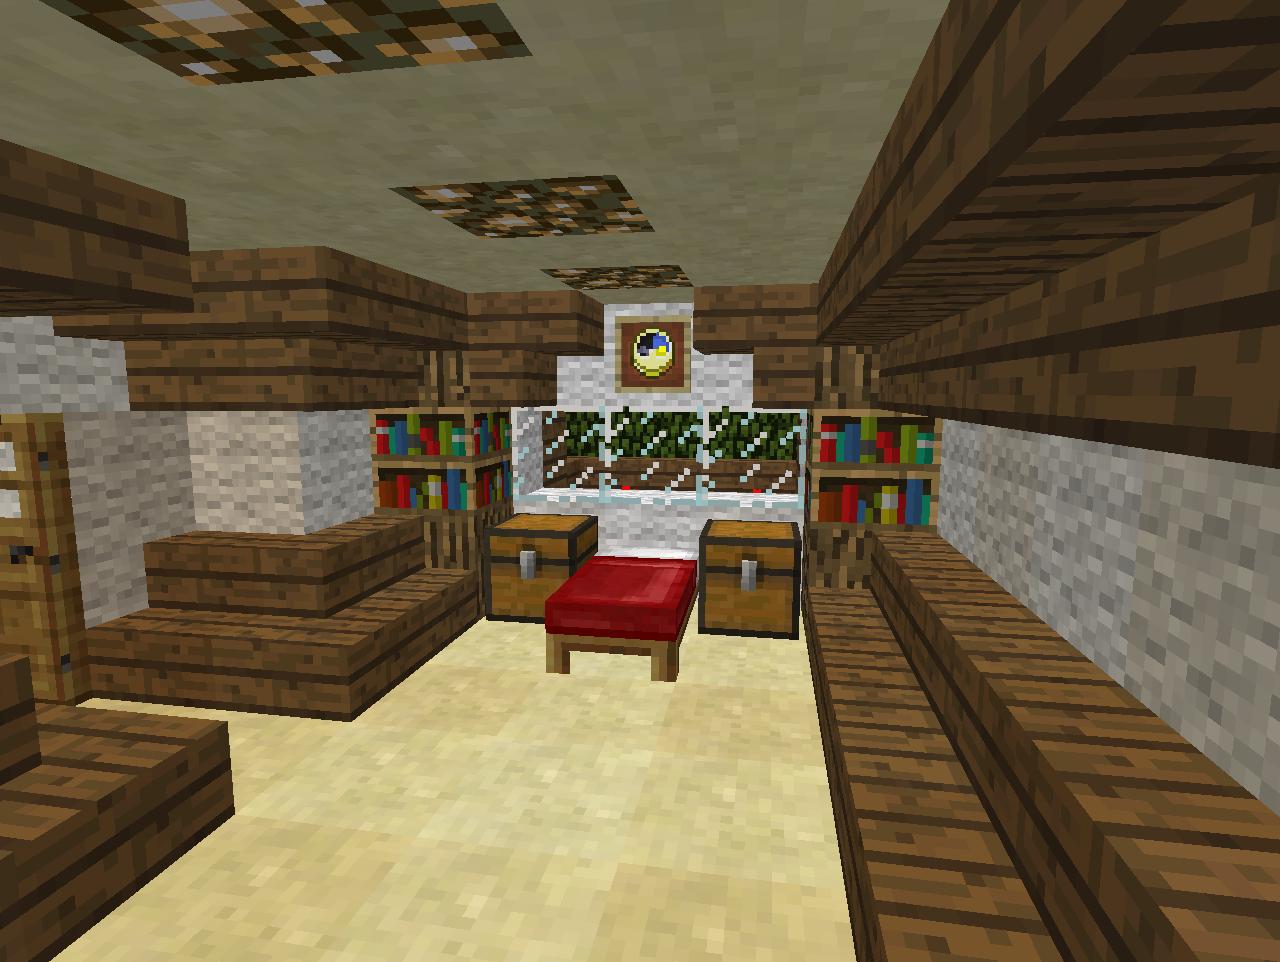 Hobbit Home Interior Pt2 By ColtCoyote Hobbit Home Interior Pt2 By  ColtCoyote Part 71